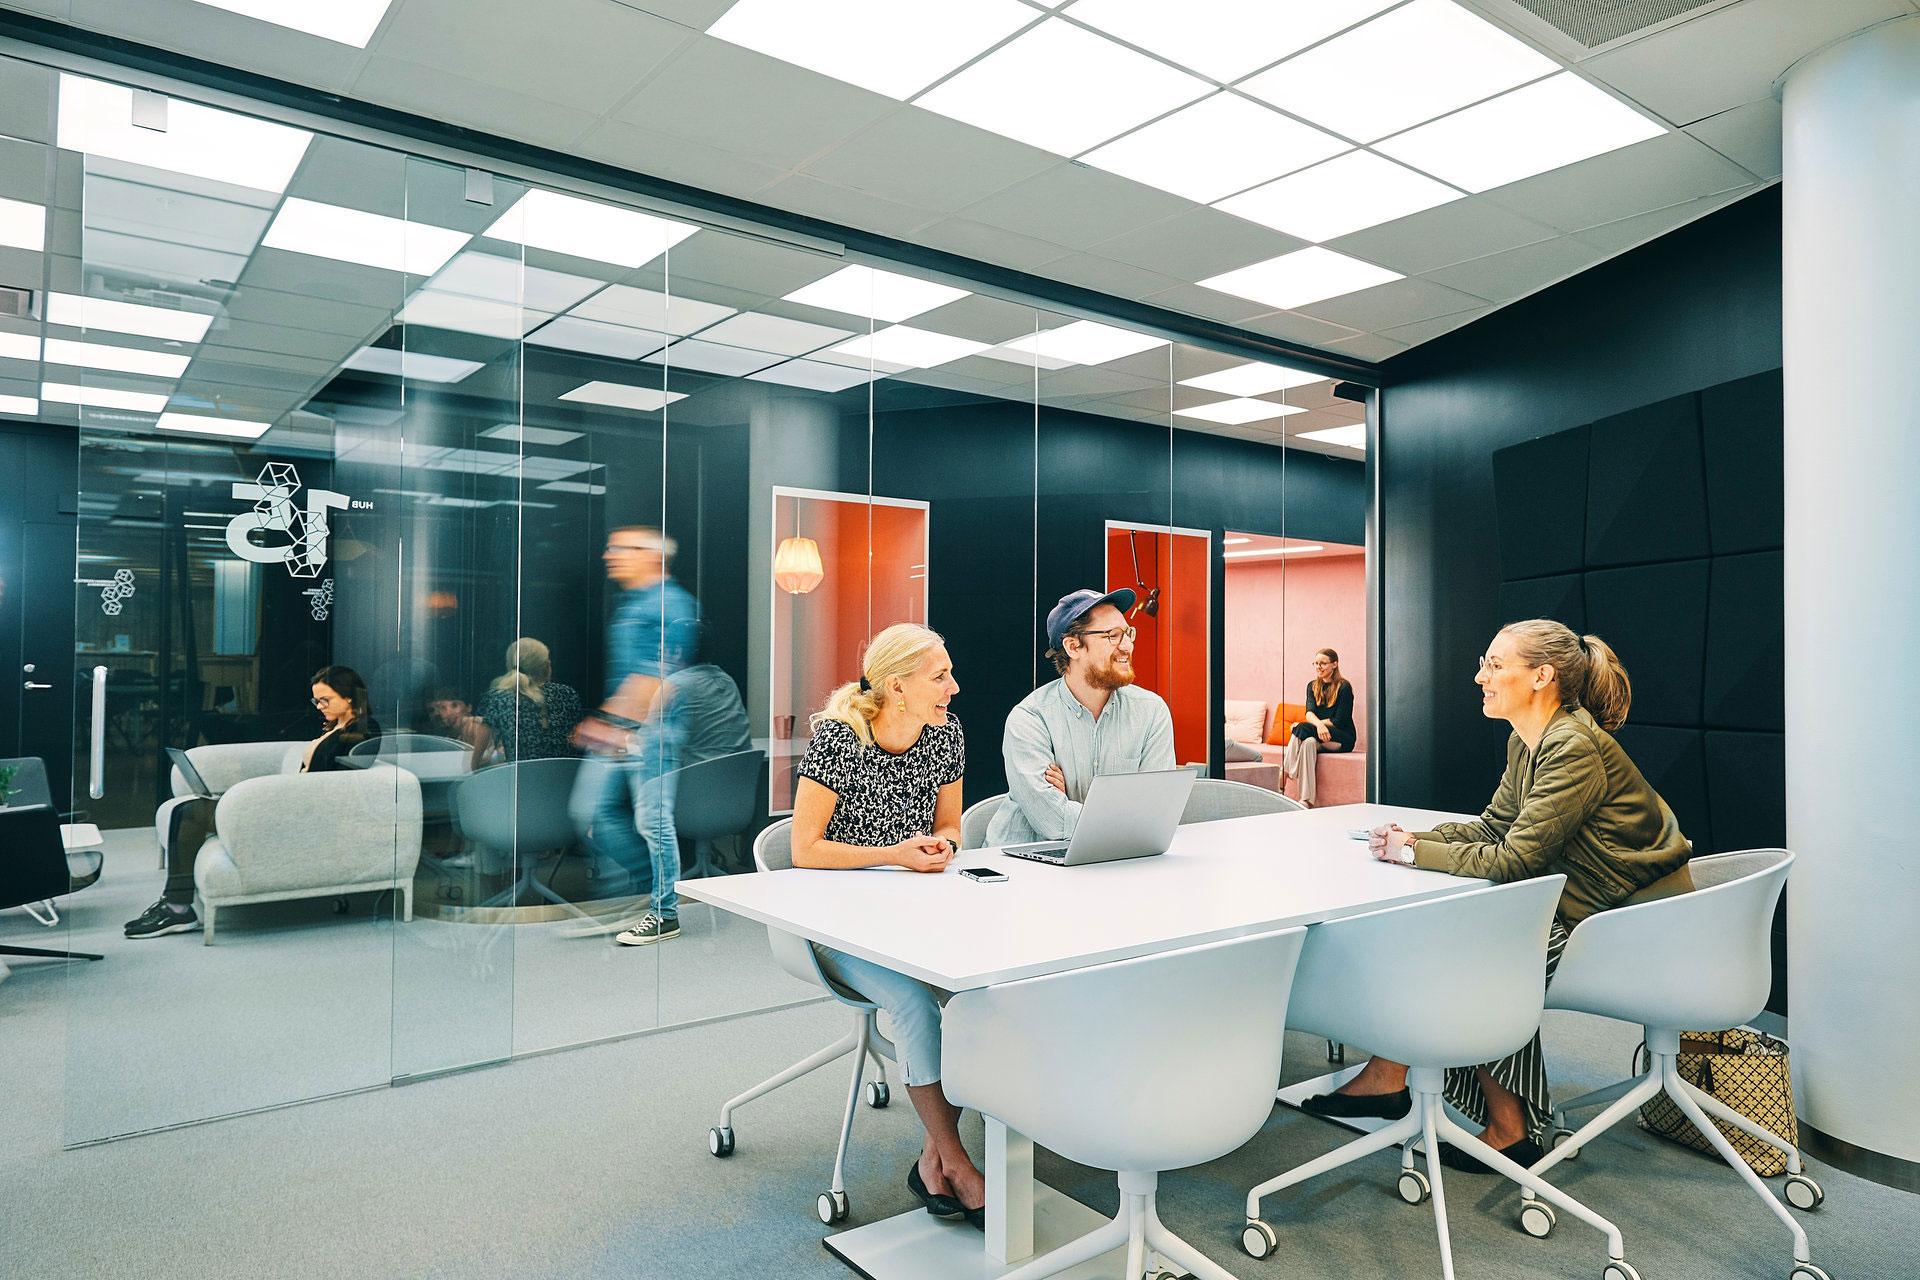 Coworking medlemskap hos expectrum i Västerås. Fotograf: Af Adam